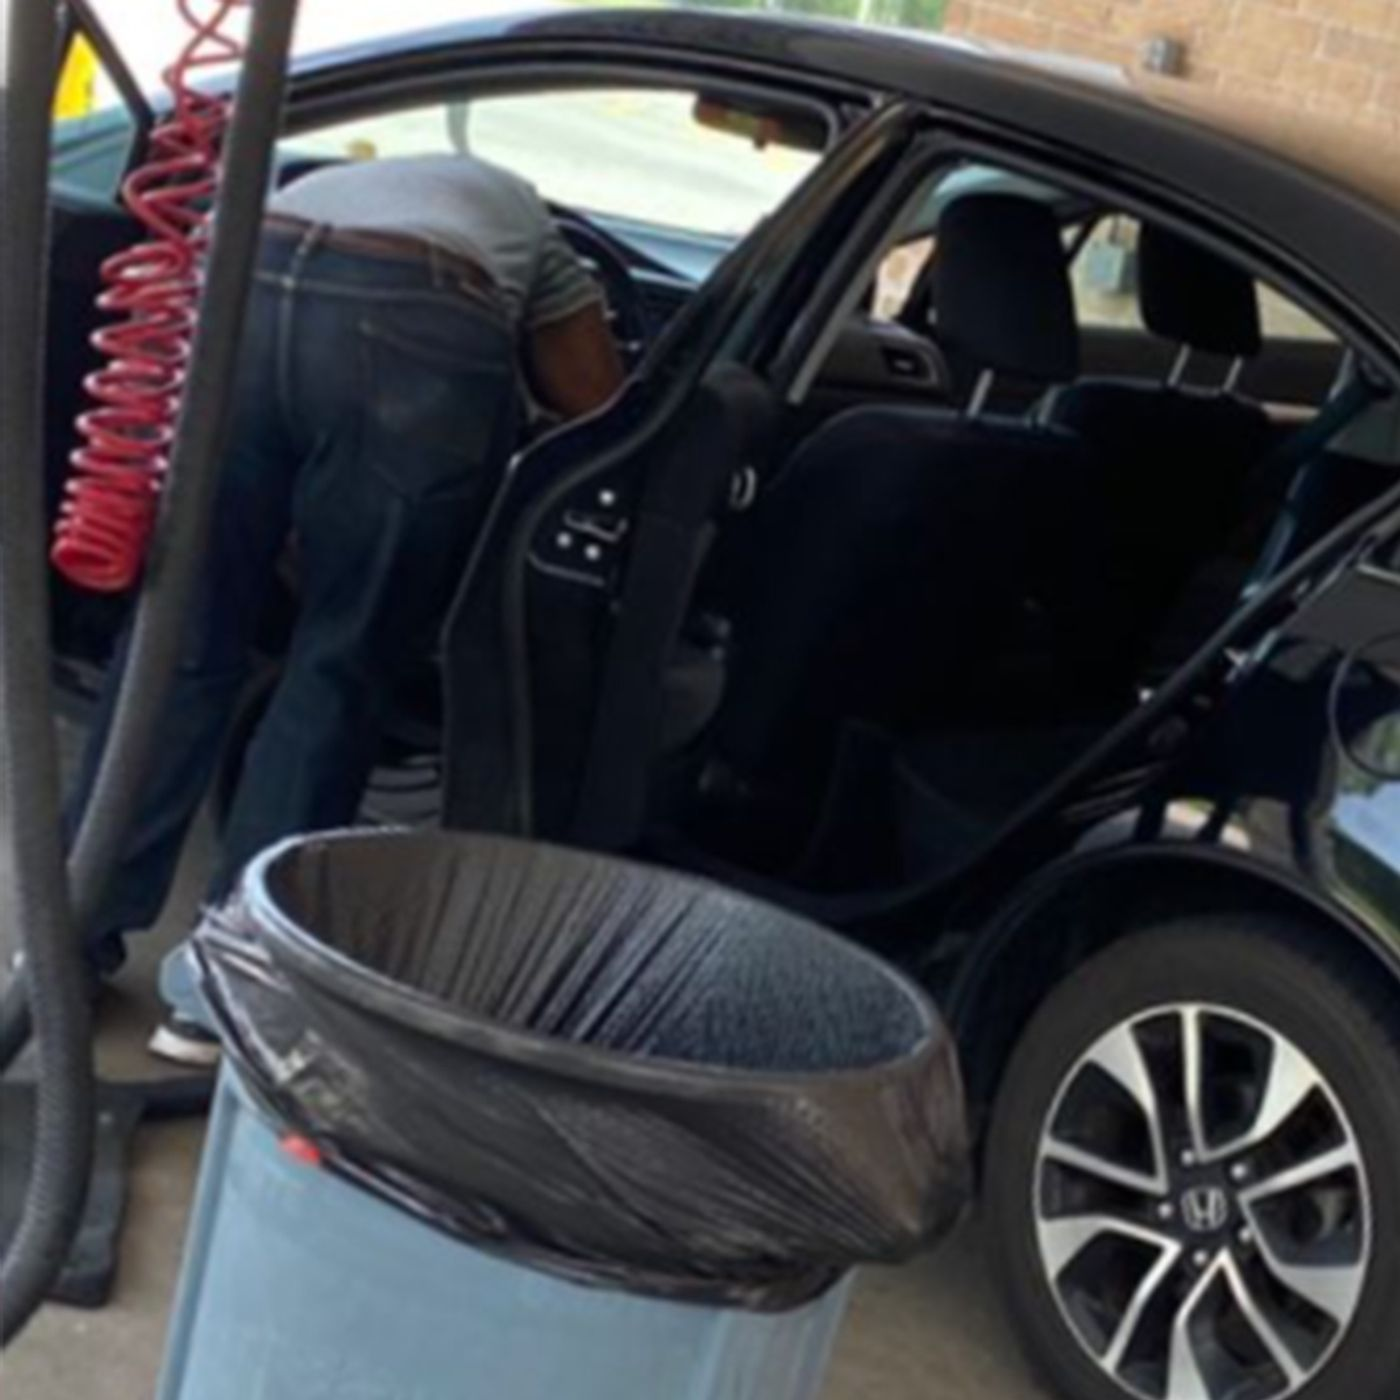 Duryan got GOT (by a carwash) plus PK's closet almost makes the gang vomit